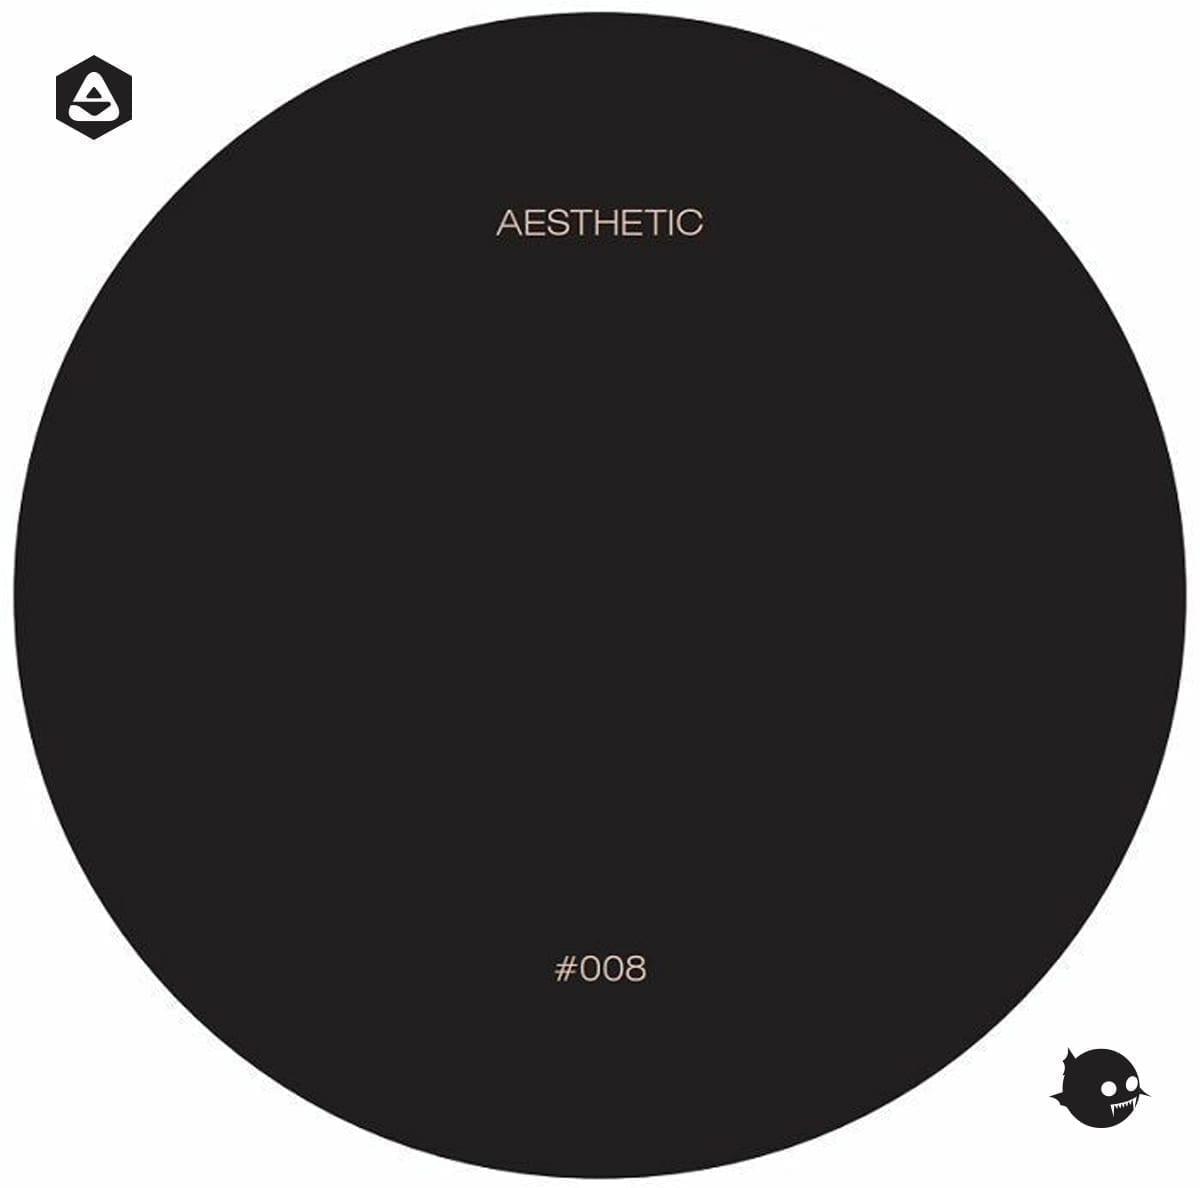 Gruia - Un Vechi Inceput [Aesthetic] 01